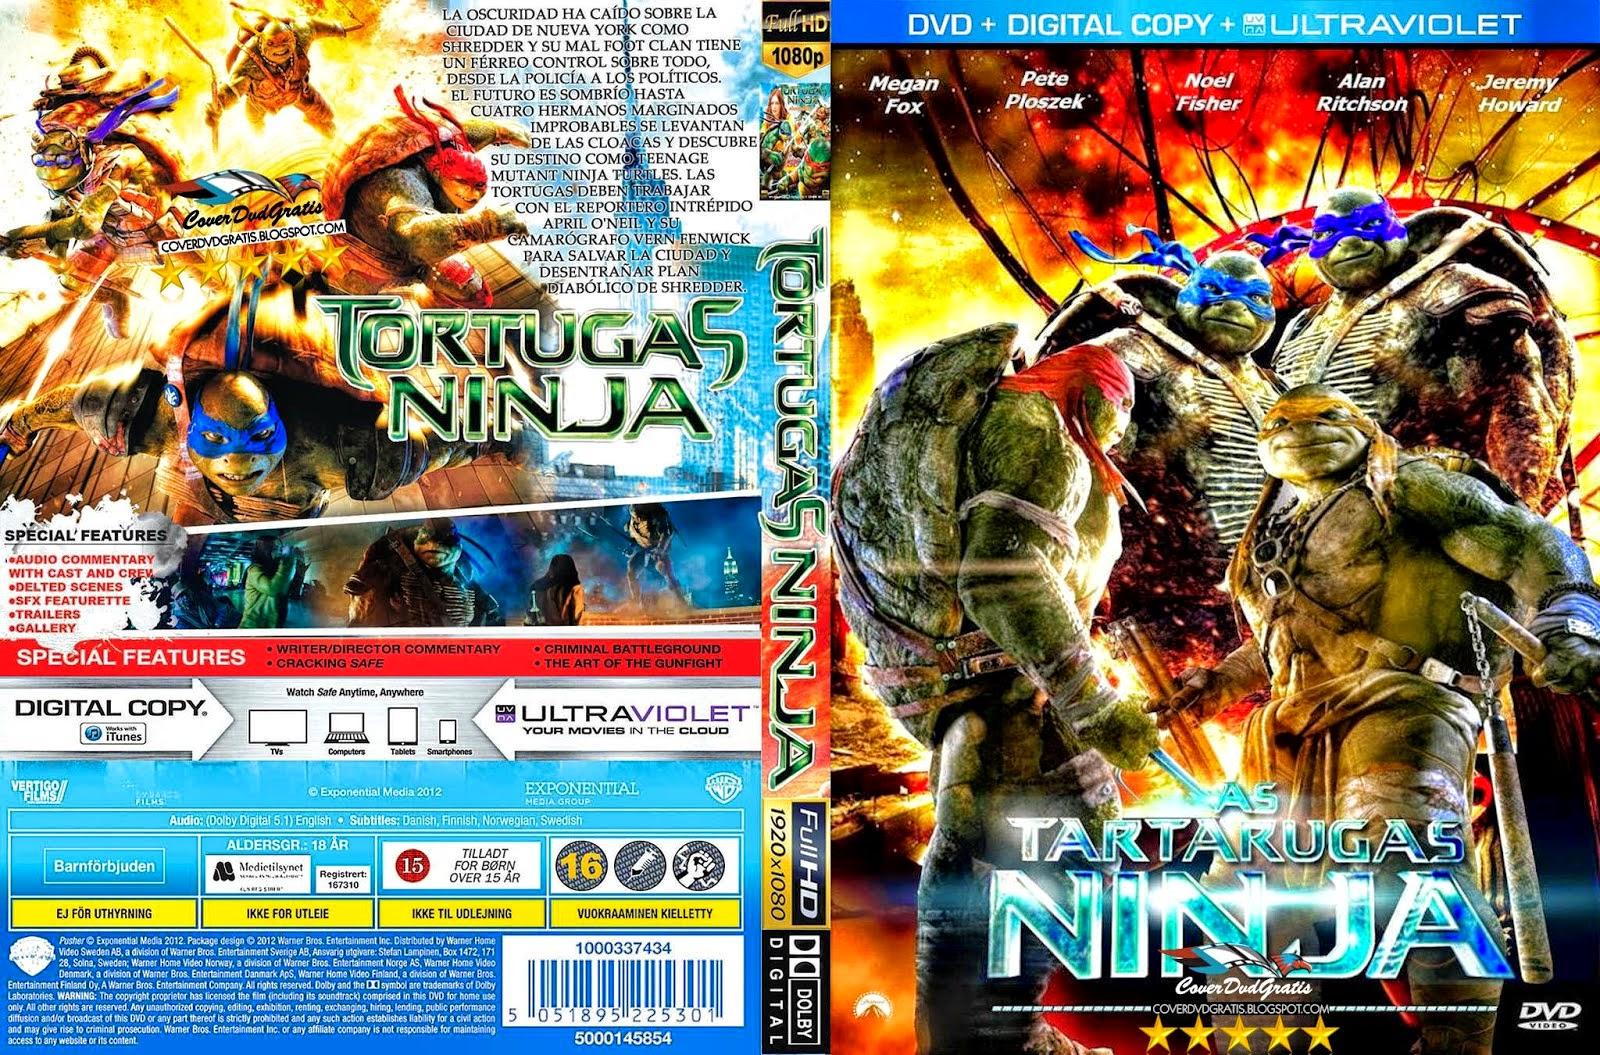 Las Tortugas Ninja DVD 2014